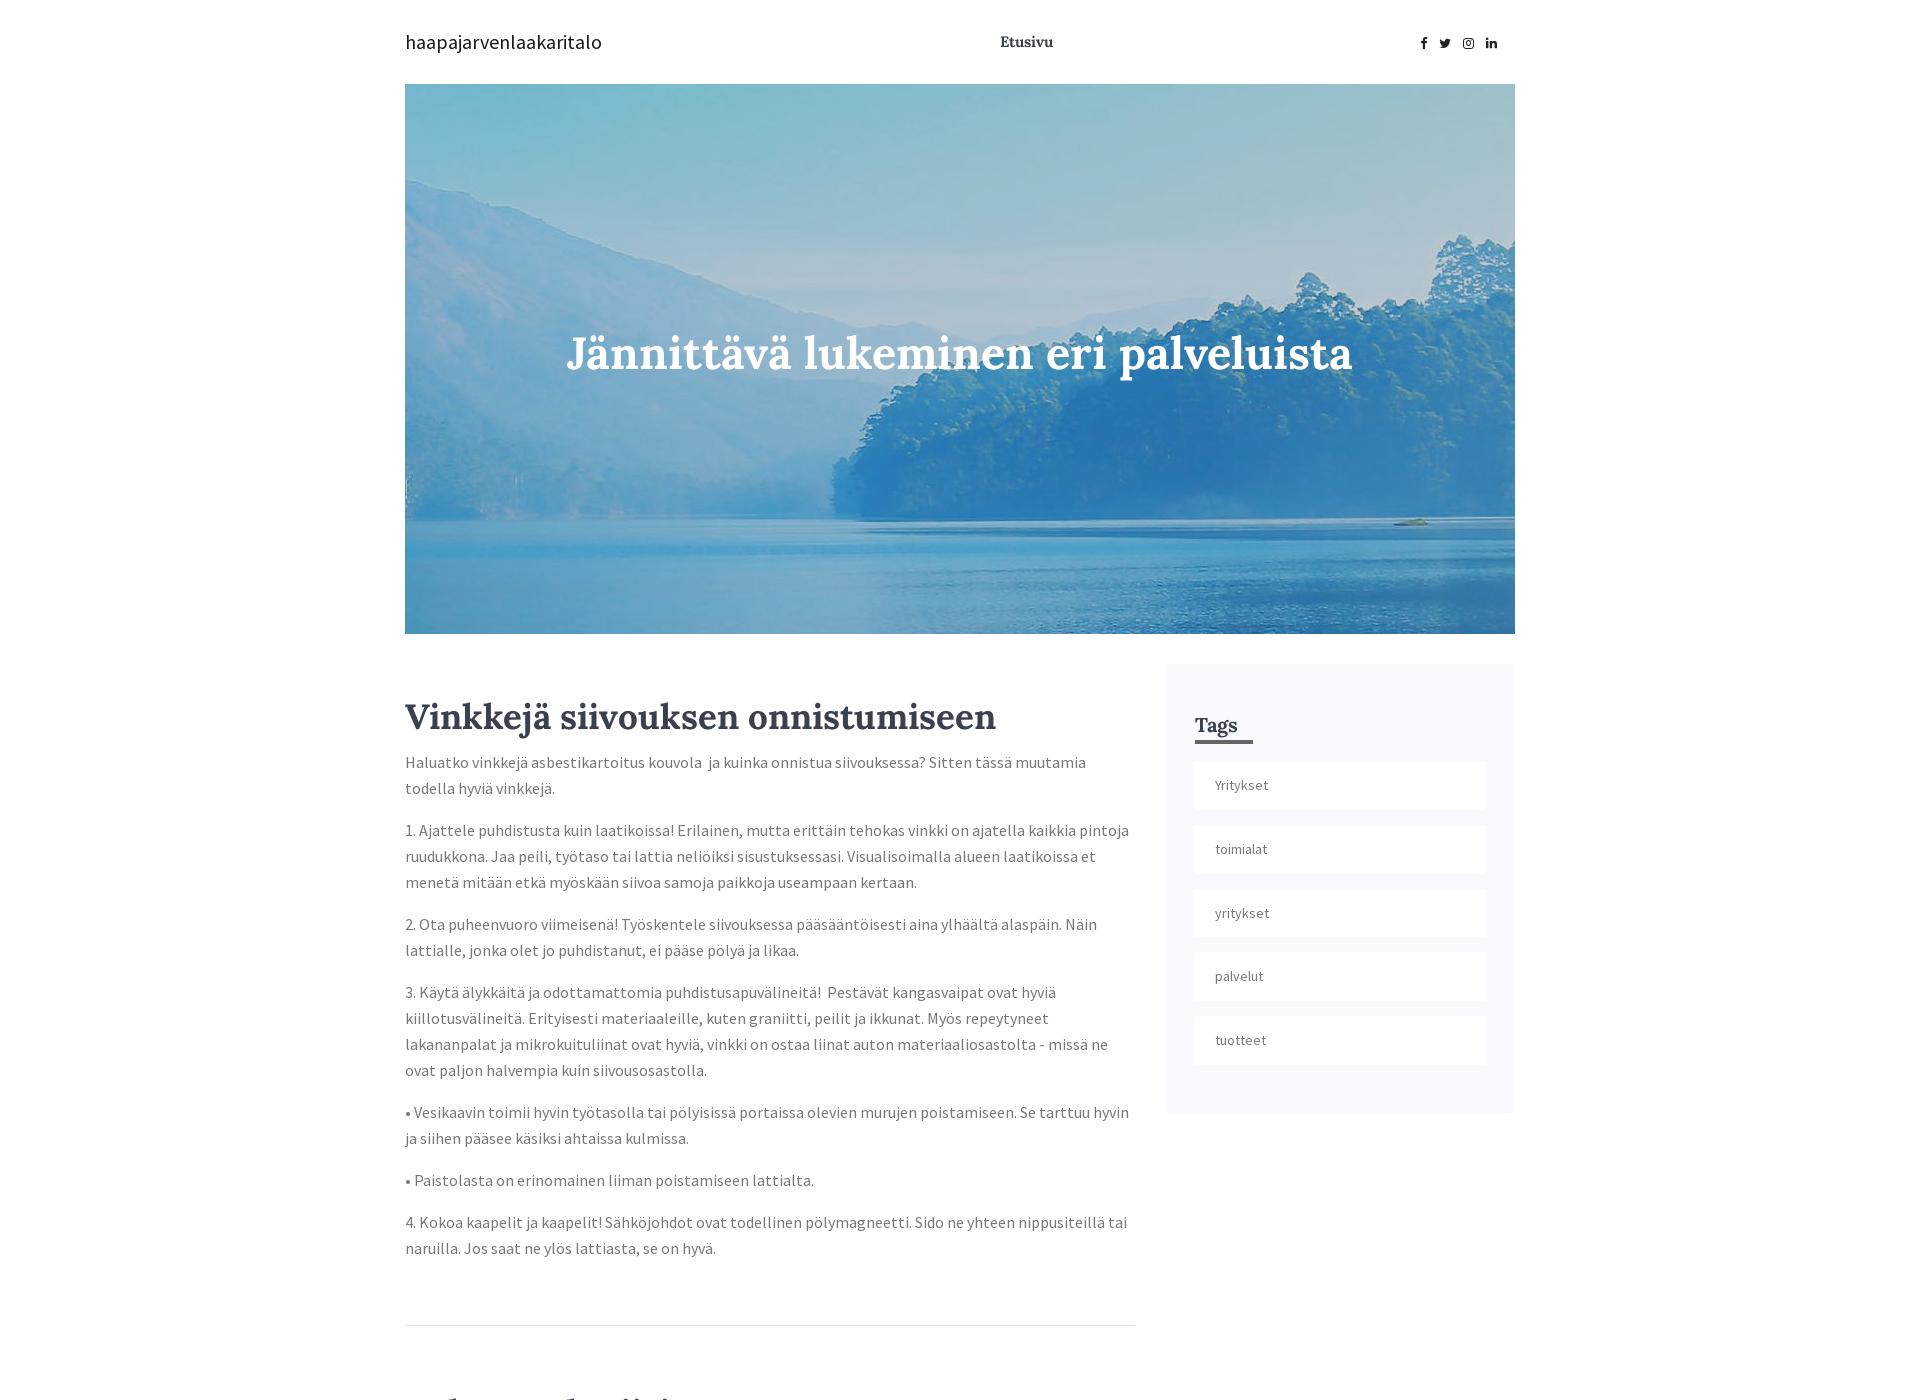 Screenshot for haapajarvenlaakaritalo.fi